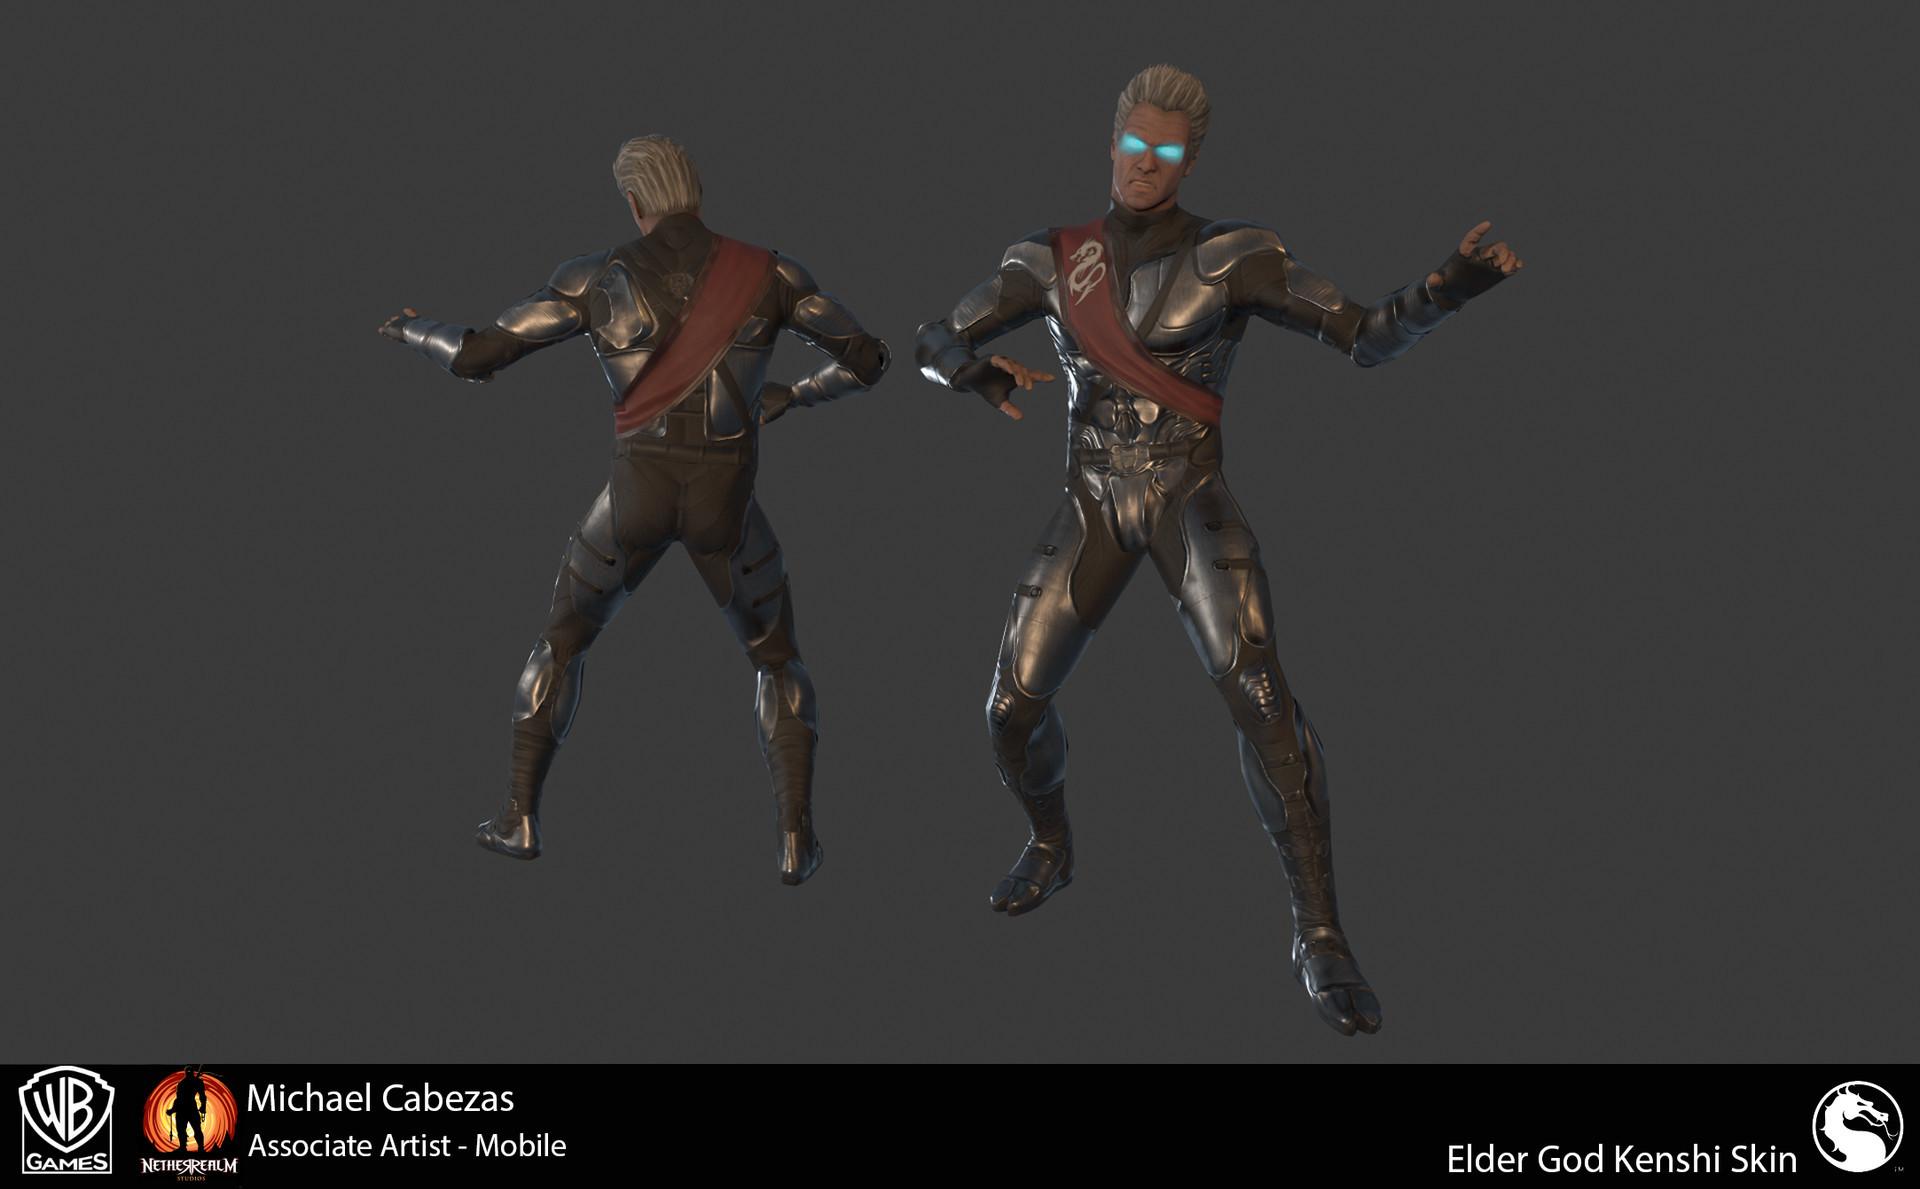 Michael Cabezas - Character Work Injustice 2, Mortal Kombat X